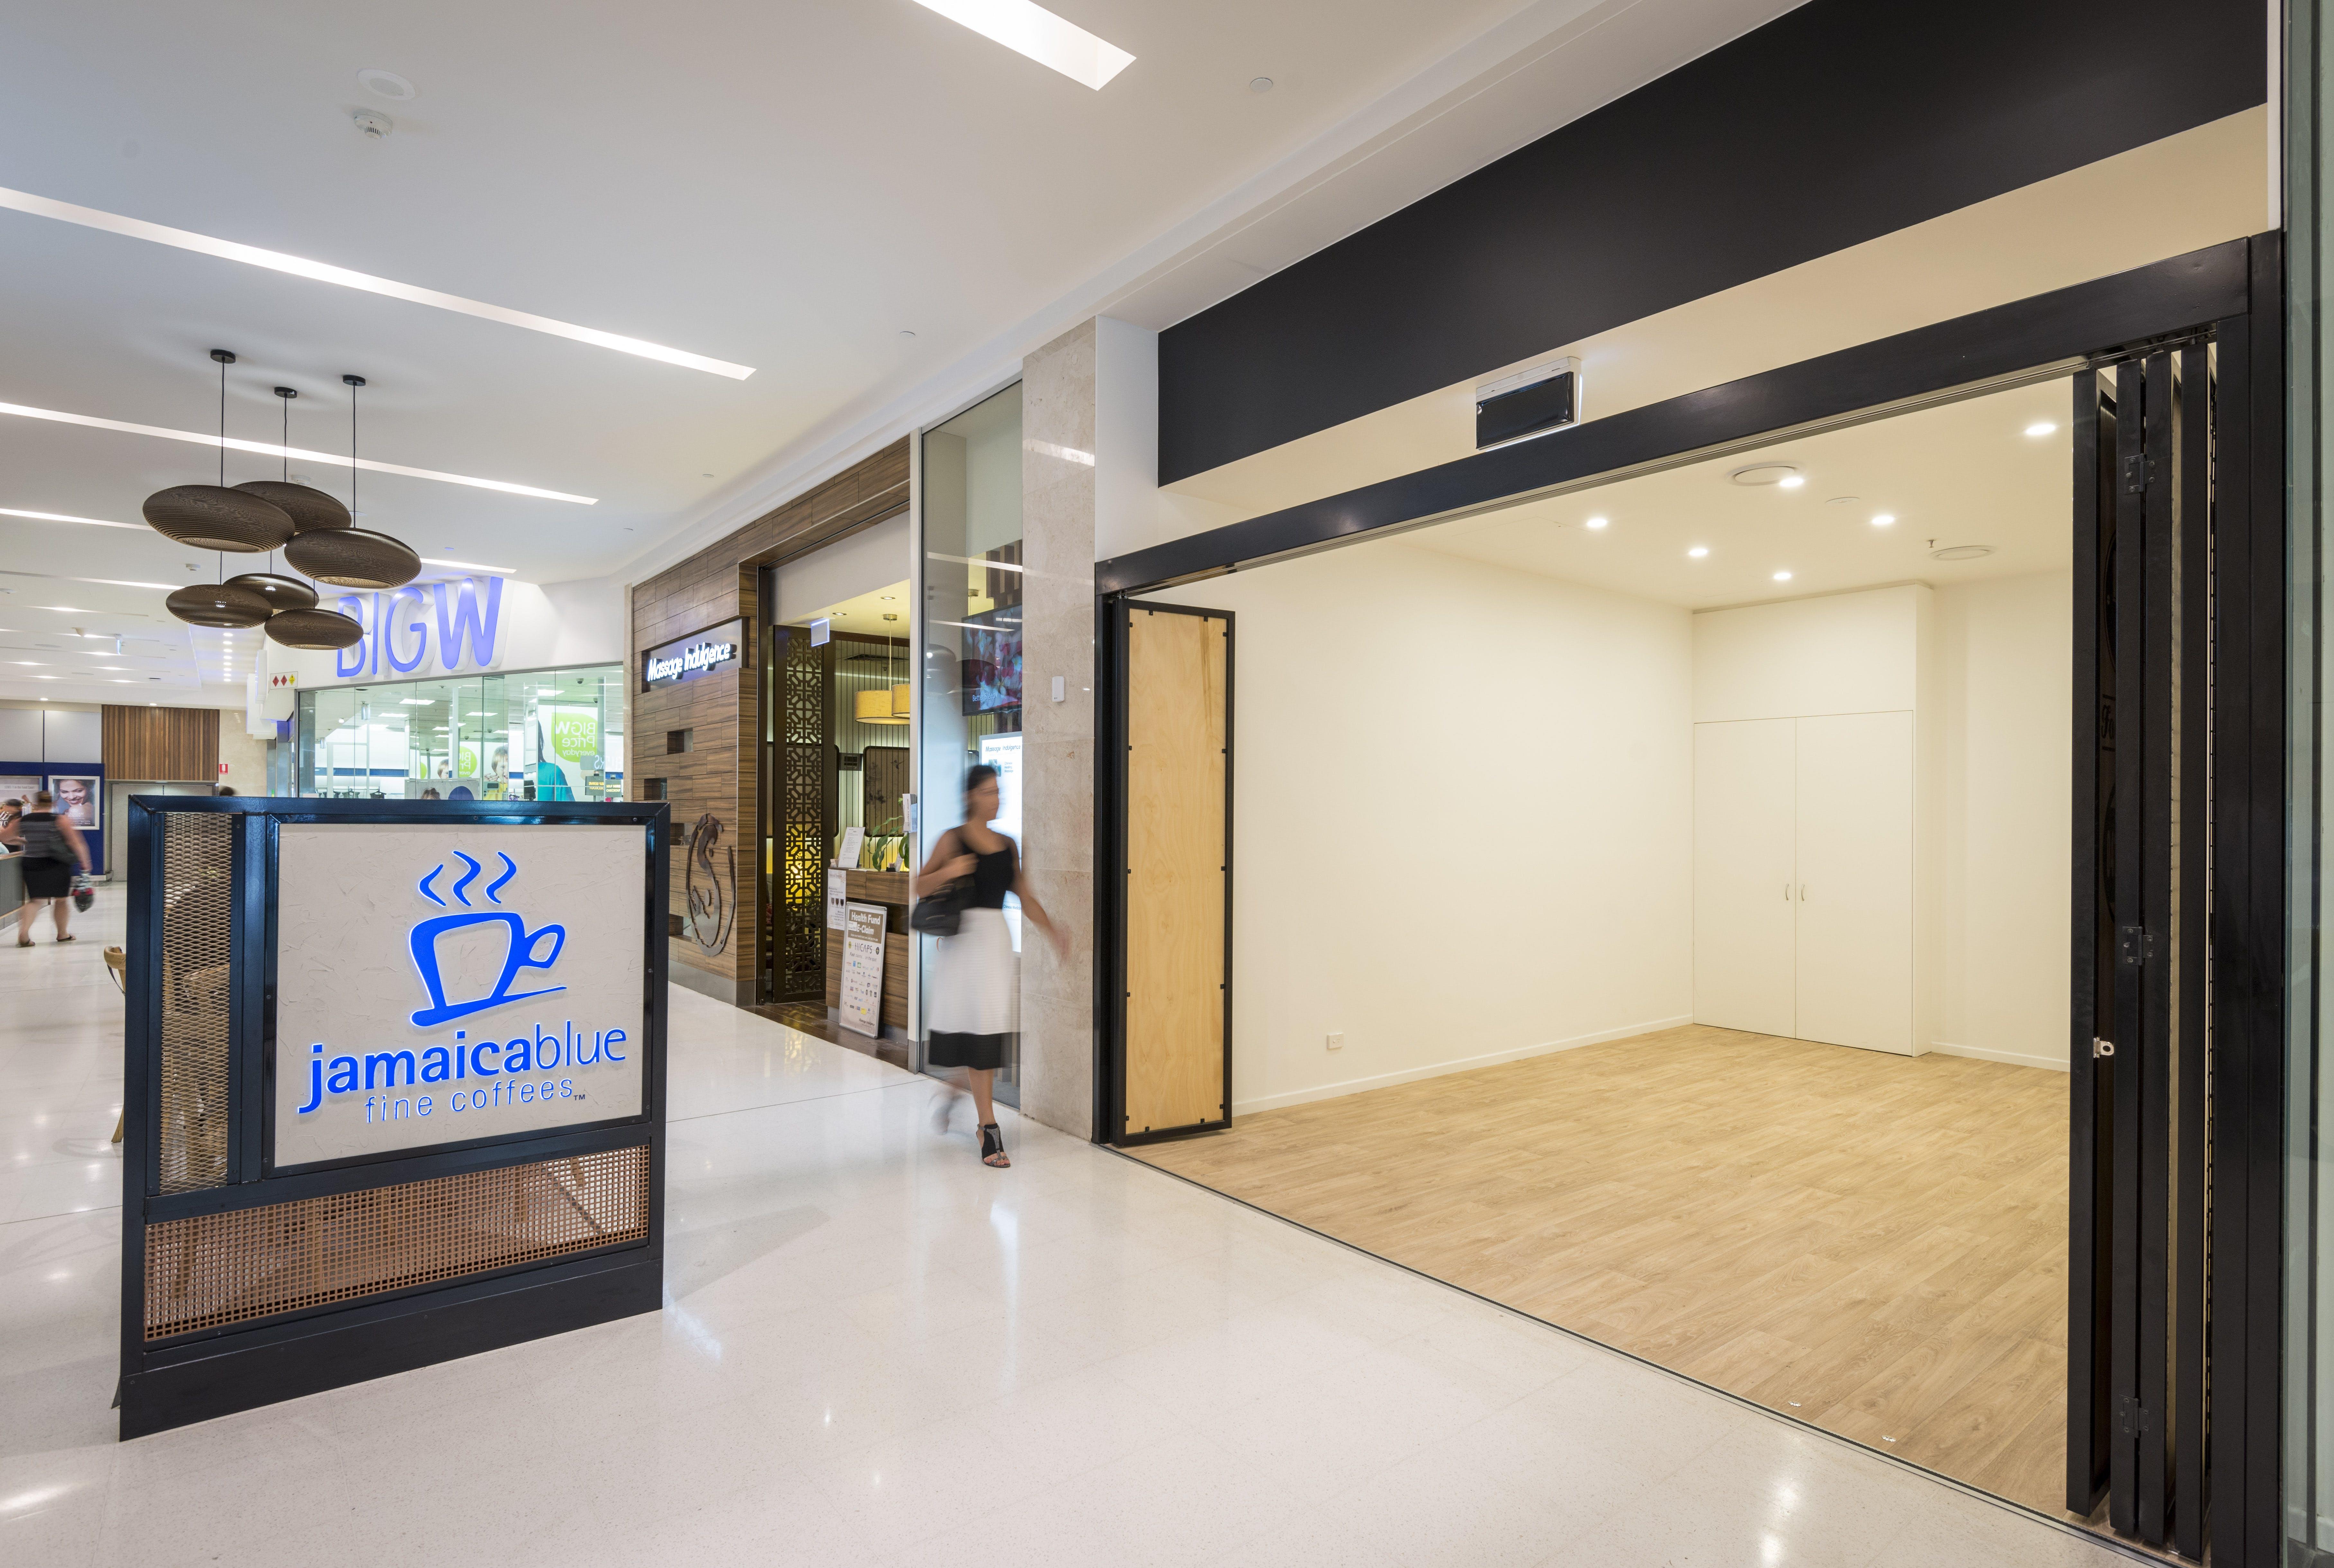 G20B, pop-up shop at MacArthur Central Shopping Centre, image 1